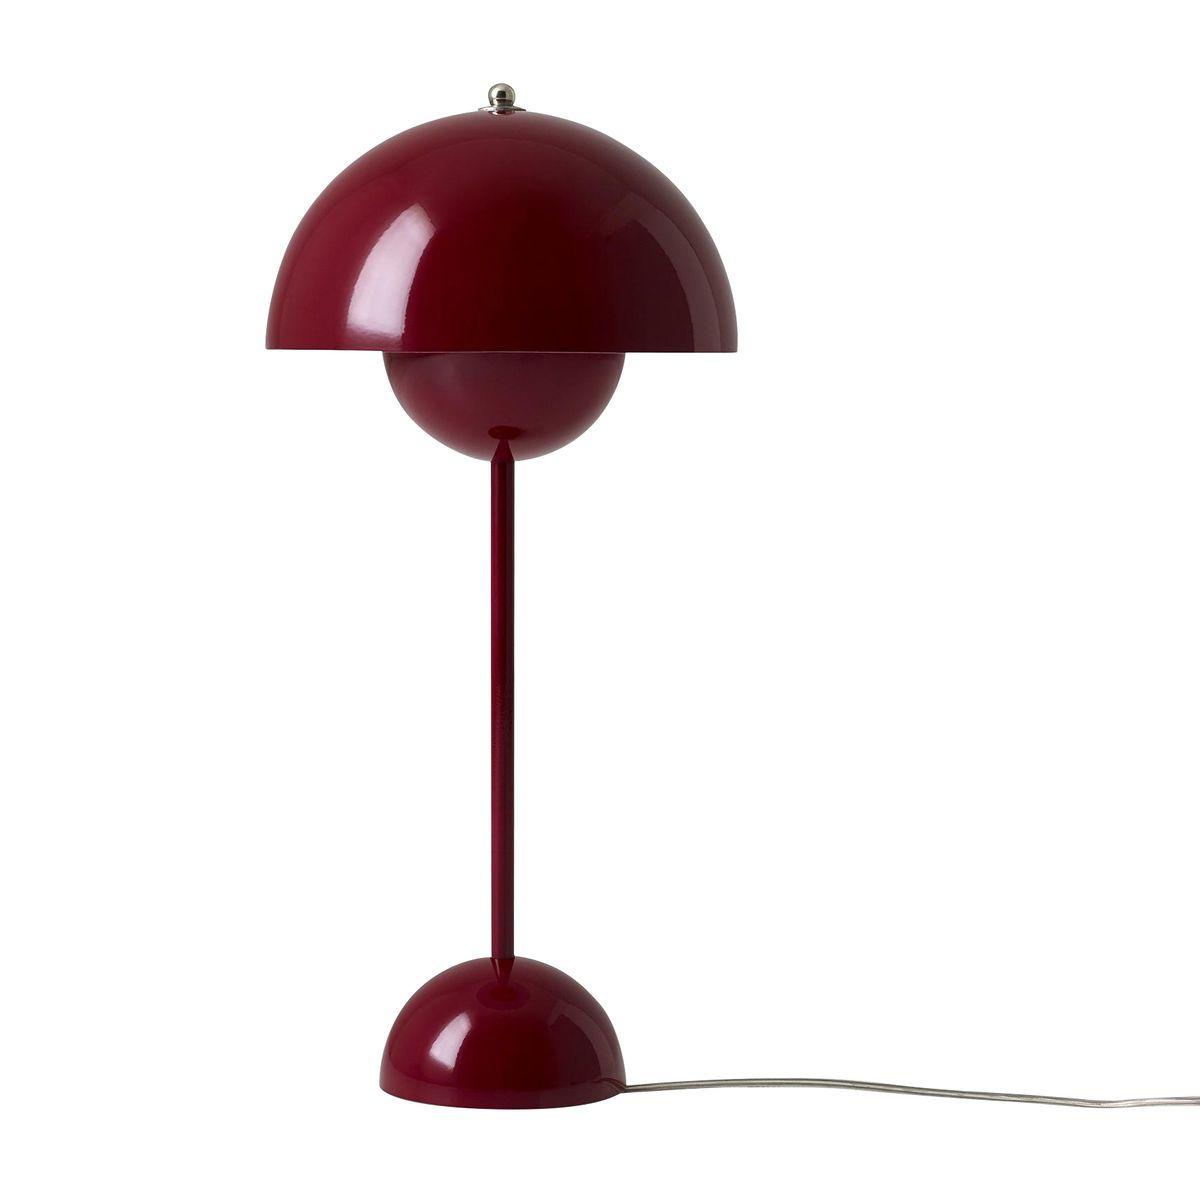 flower pot vp table lamp  andtradition  ambientedirectcom - andtradition  flower pot vp table lamp  deep redh x Øcm